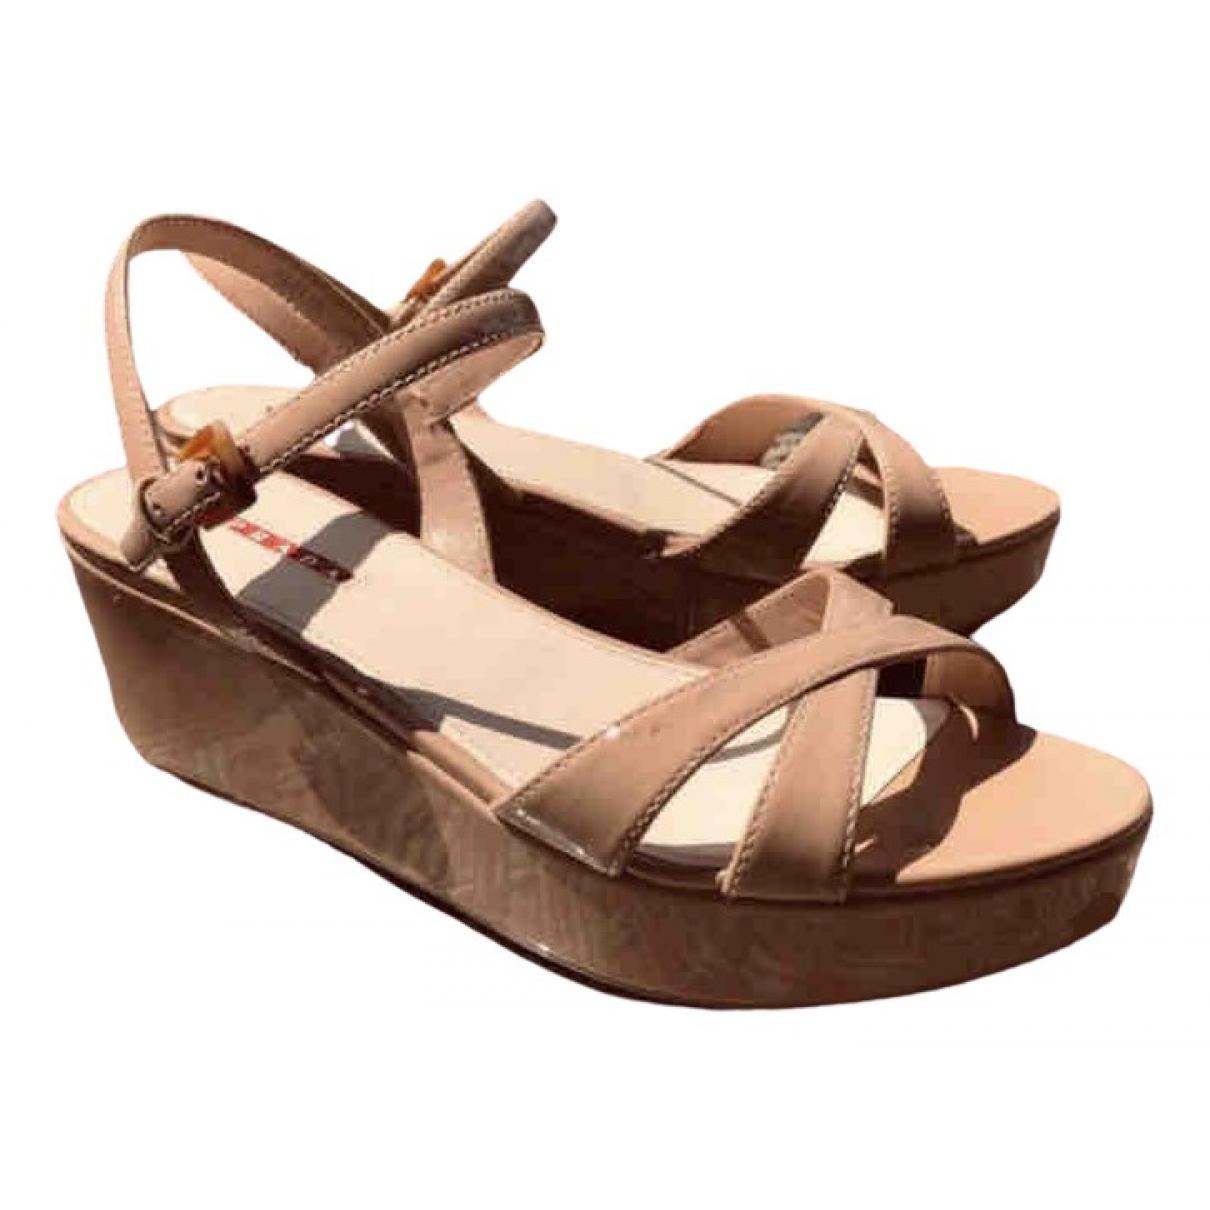 Prada \N Beige Patent leather Sandals for Women 39.5 EU